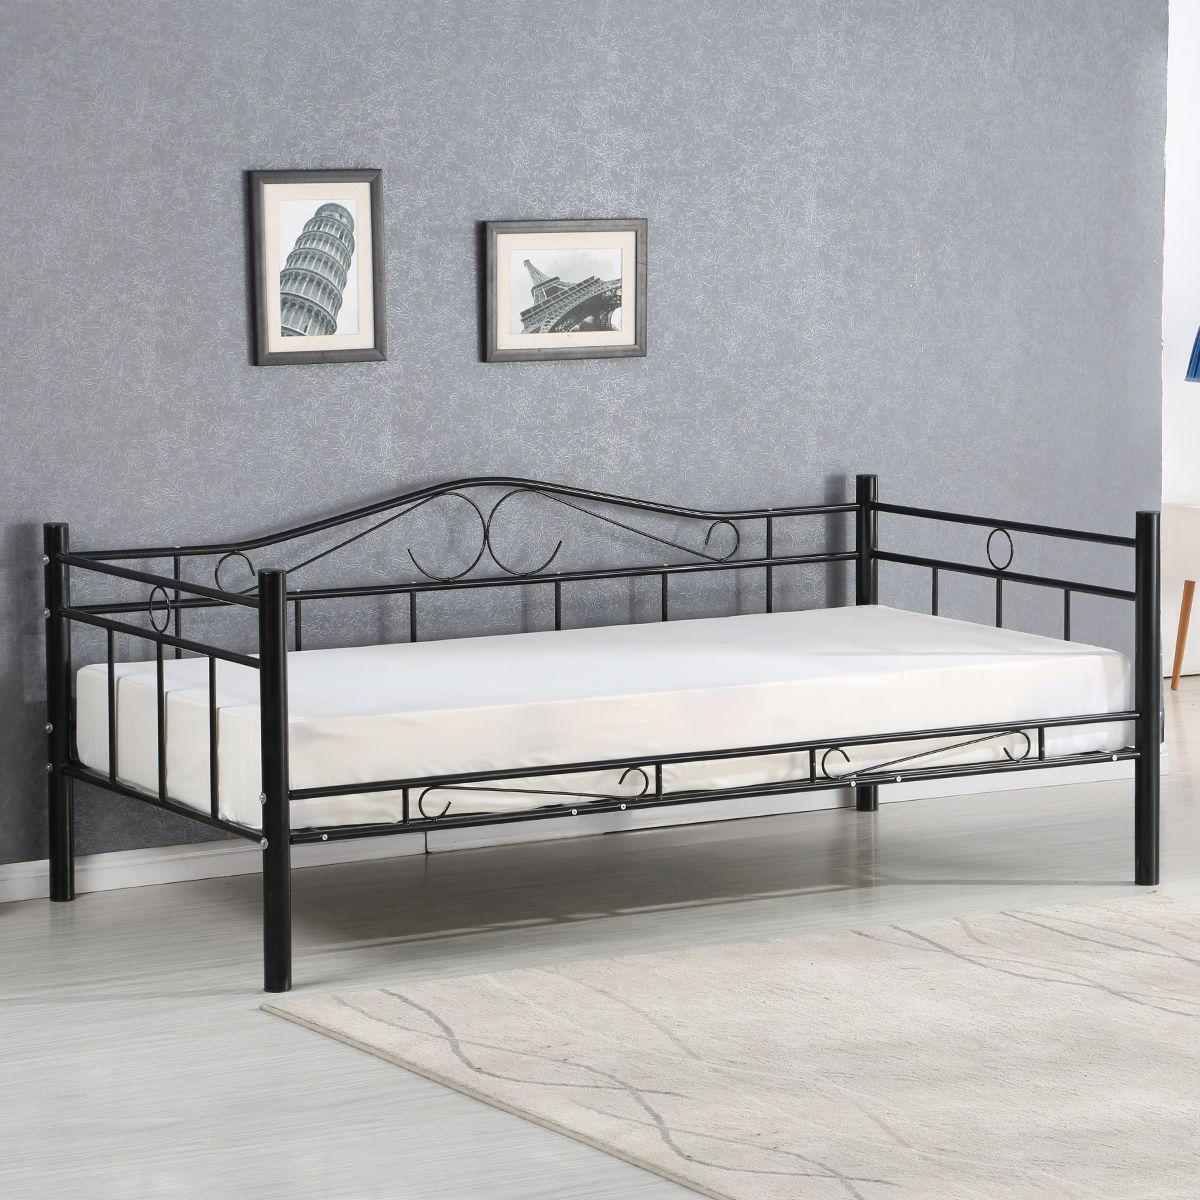 Metal Frame Sofa Bed Modern Design Pictures Perfect Framed Beds 78 For